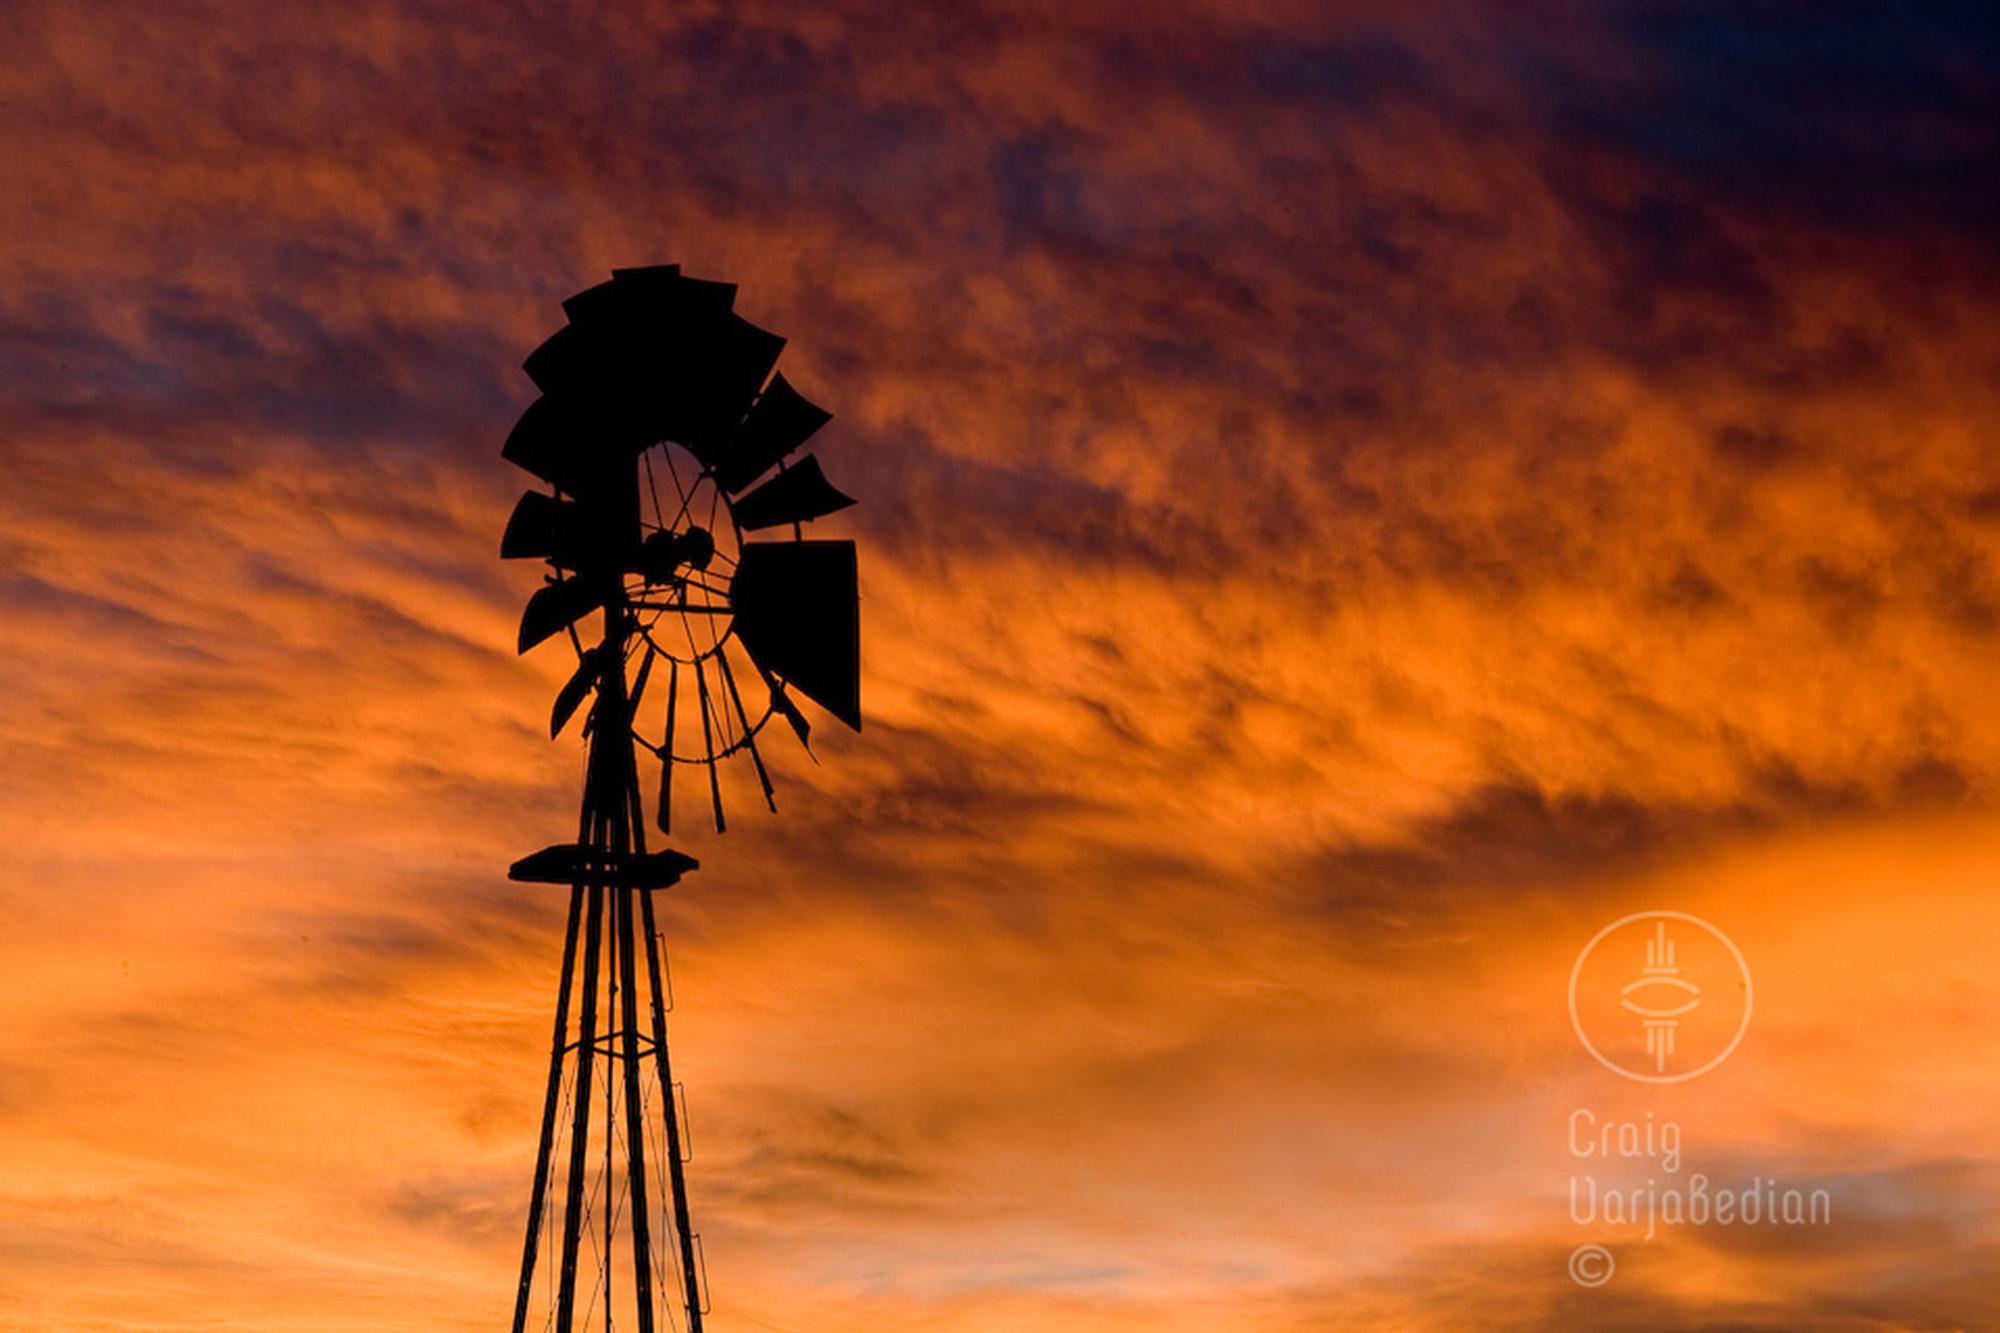 Windmill-sunset-Santa Fe-©Craig Varjabedian.jpg